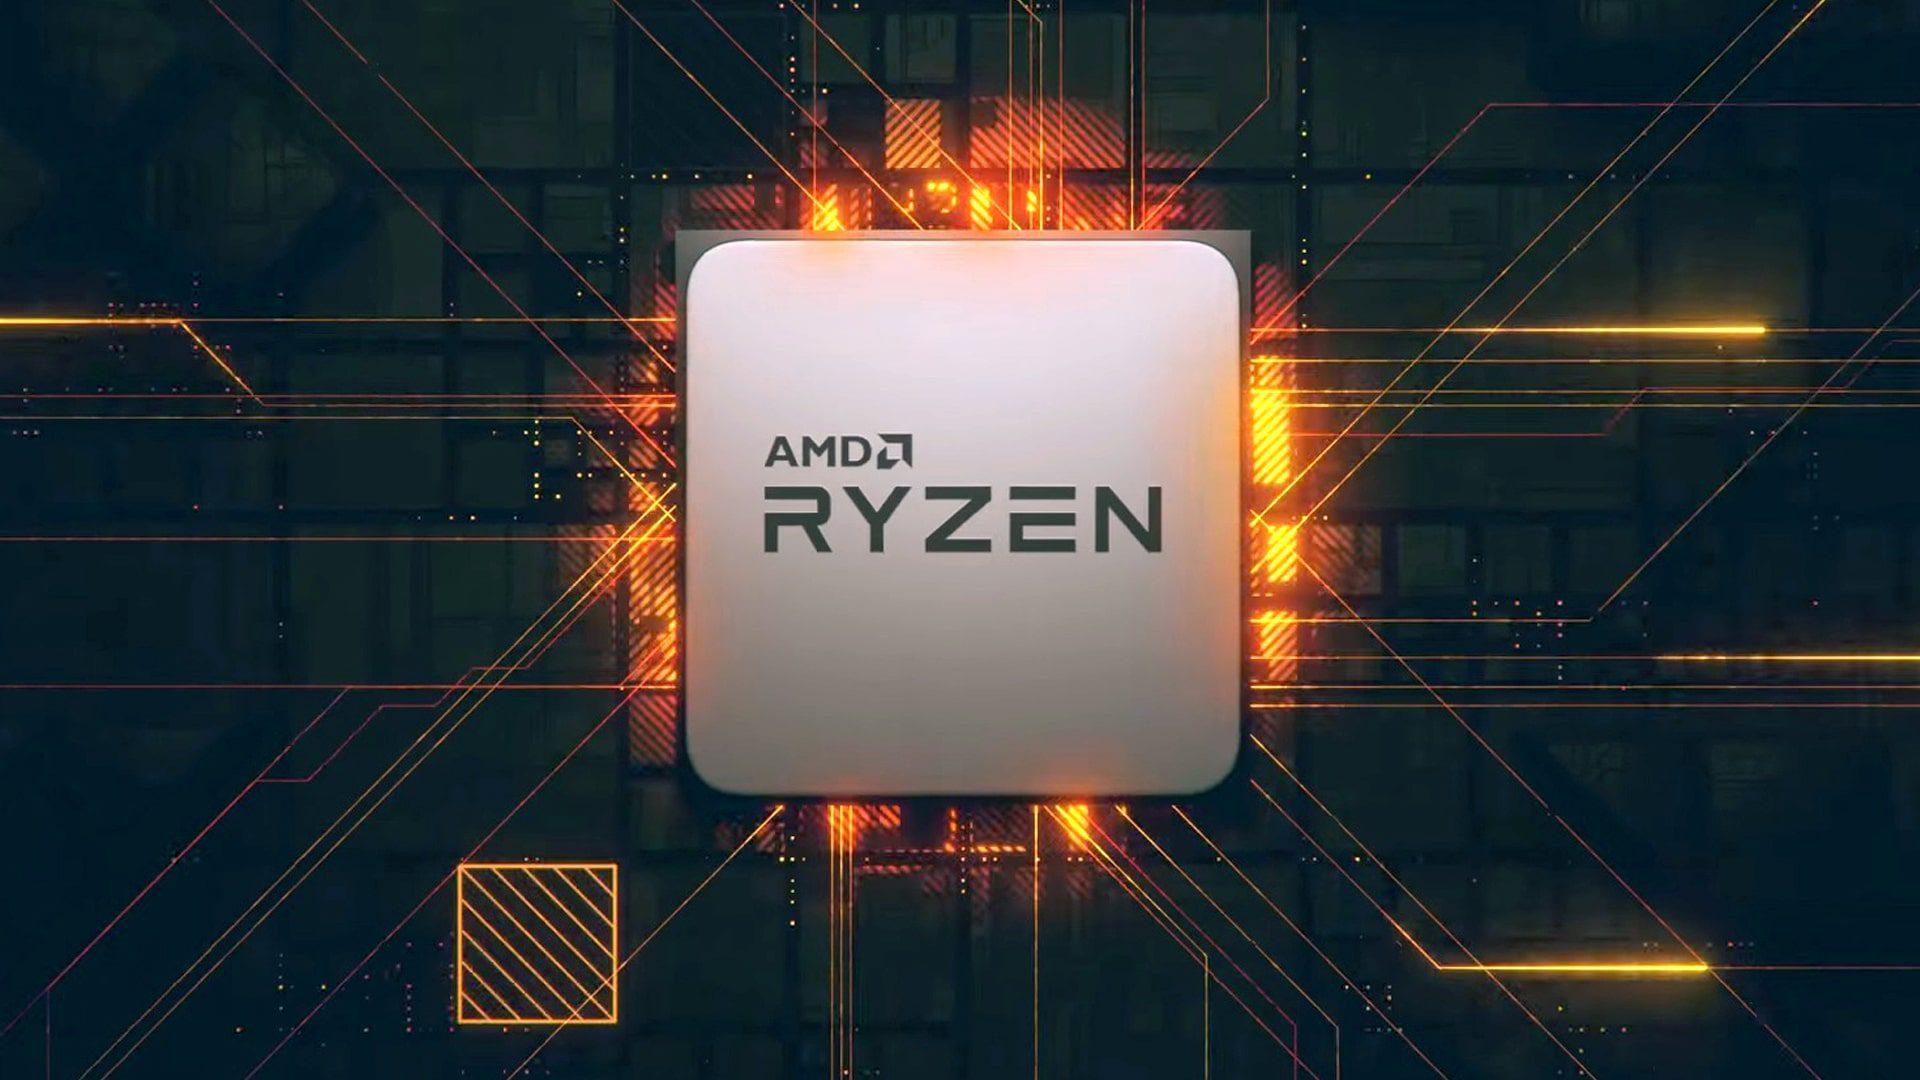 Amd Ryzen 7 4800u Spotted Running On A Lenovo Yoga Slim 7 Beats Core I7 10750h In Geekbench Technosports